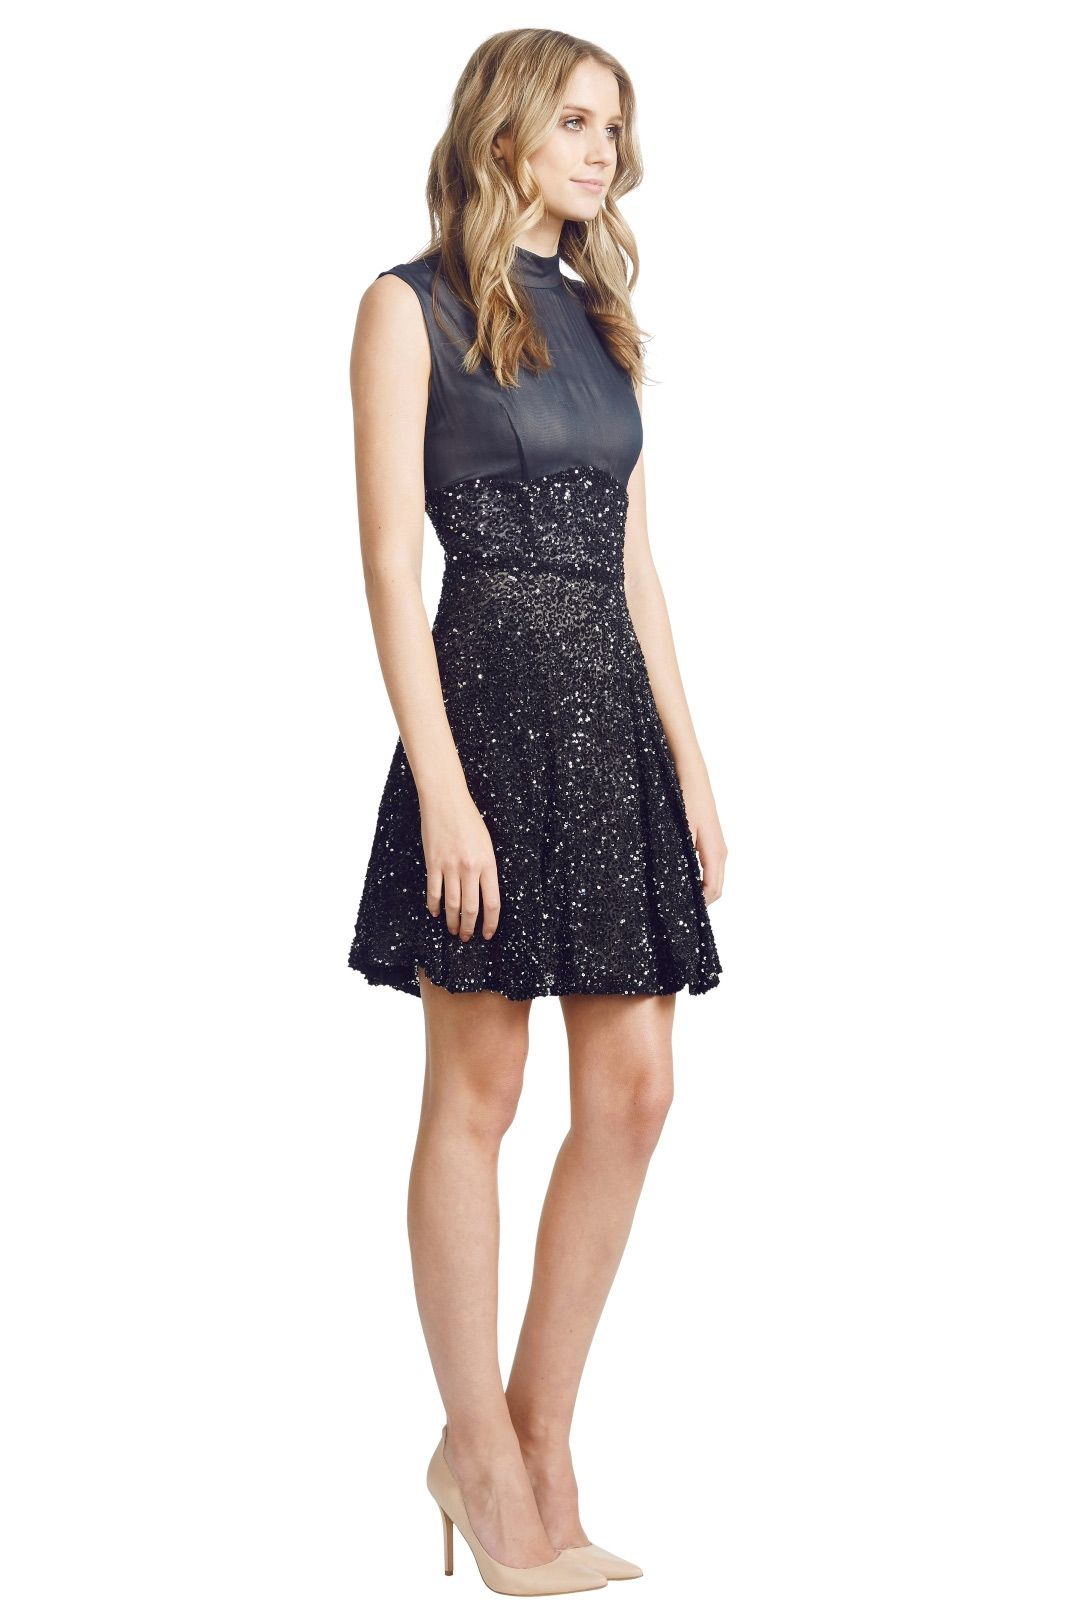 Waltz Dress By Jayson Brunsdon For Hire Glamcorner